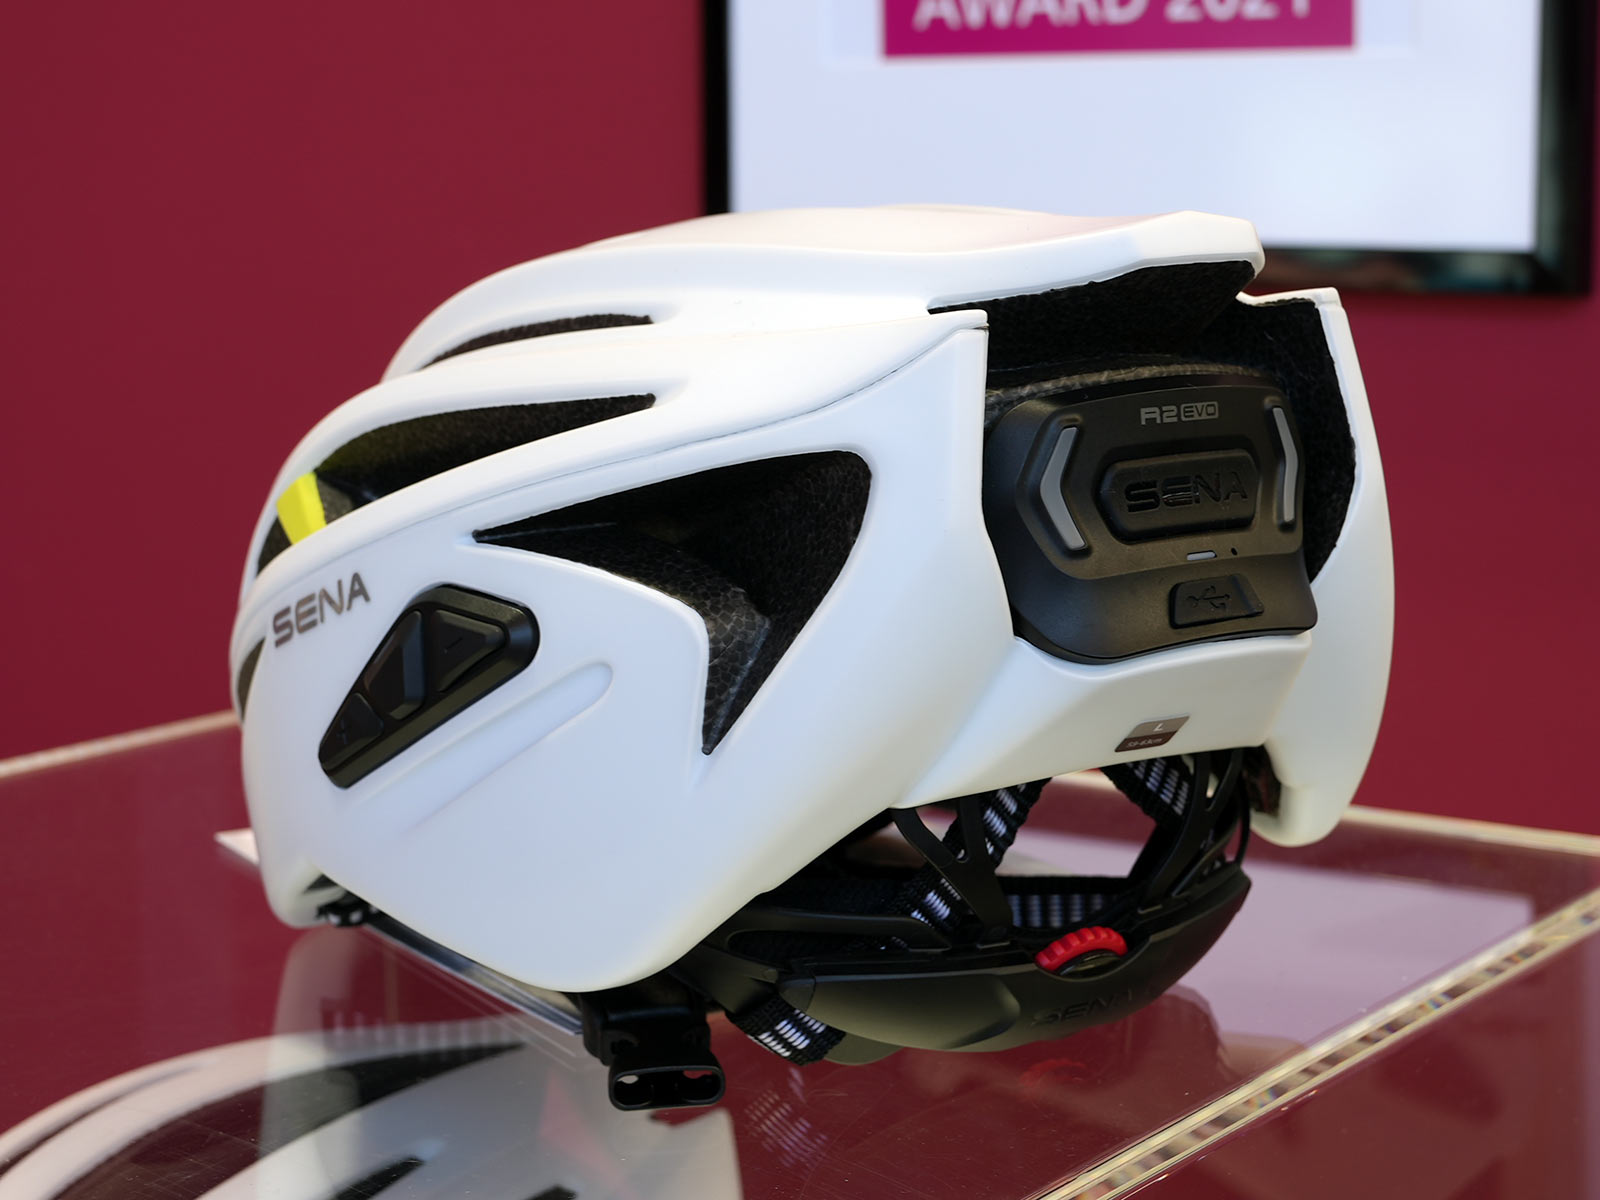 sena r2 road bike helmet with intercom wireless communication and bluetooth speaker shown from behind